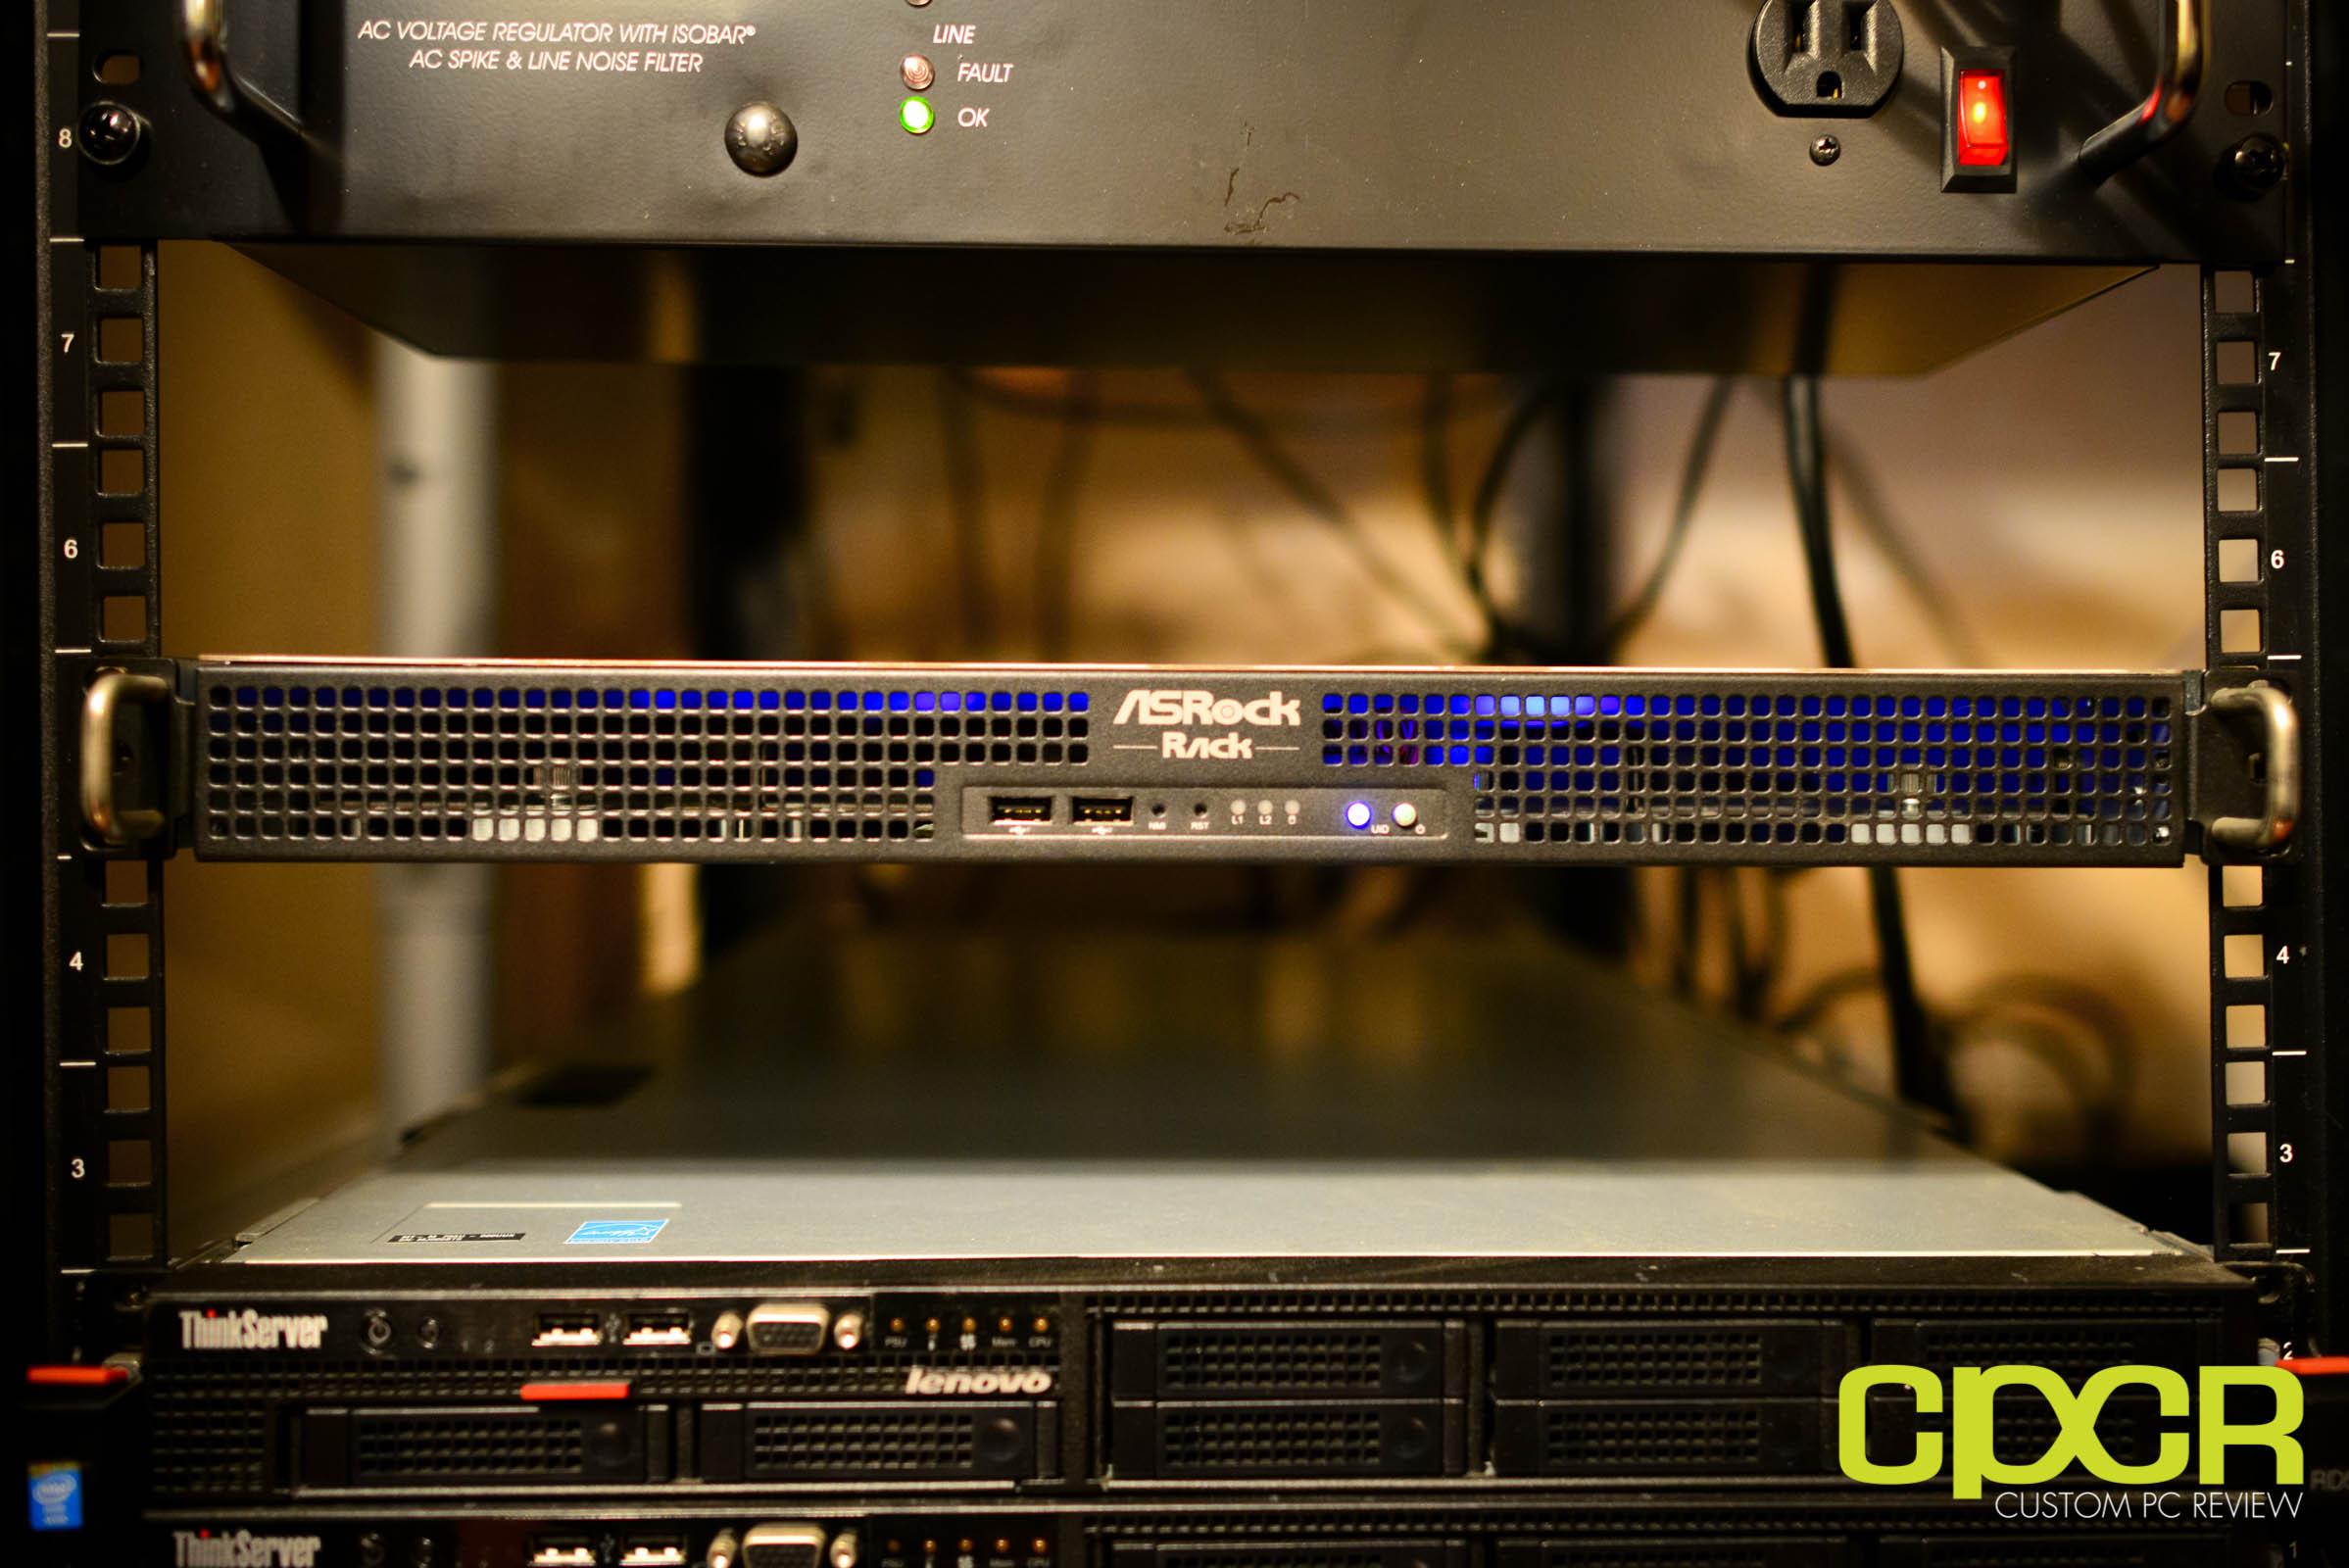 Top 5 Uses for a Home Server or NAS | Custom PC Review